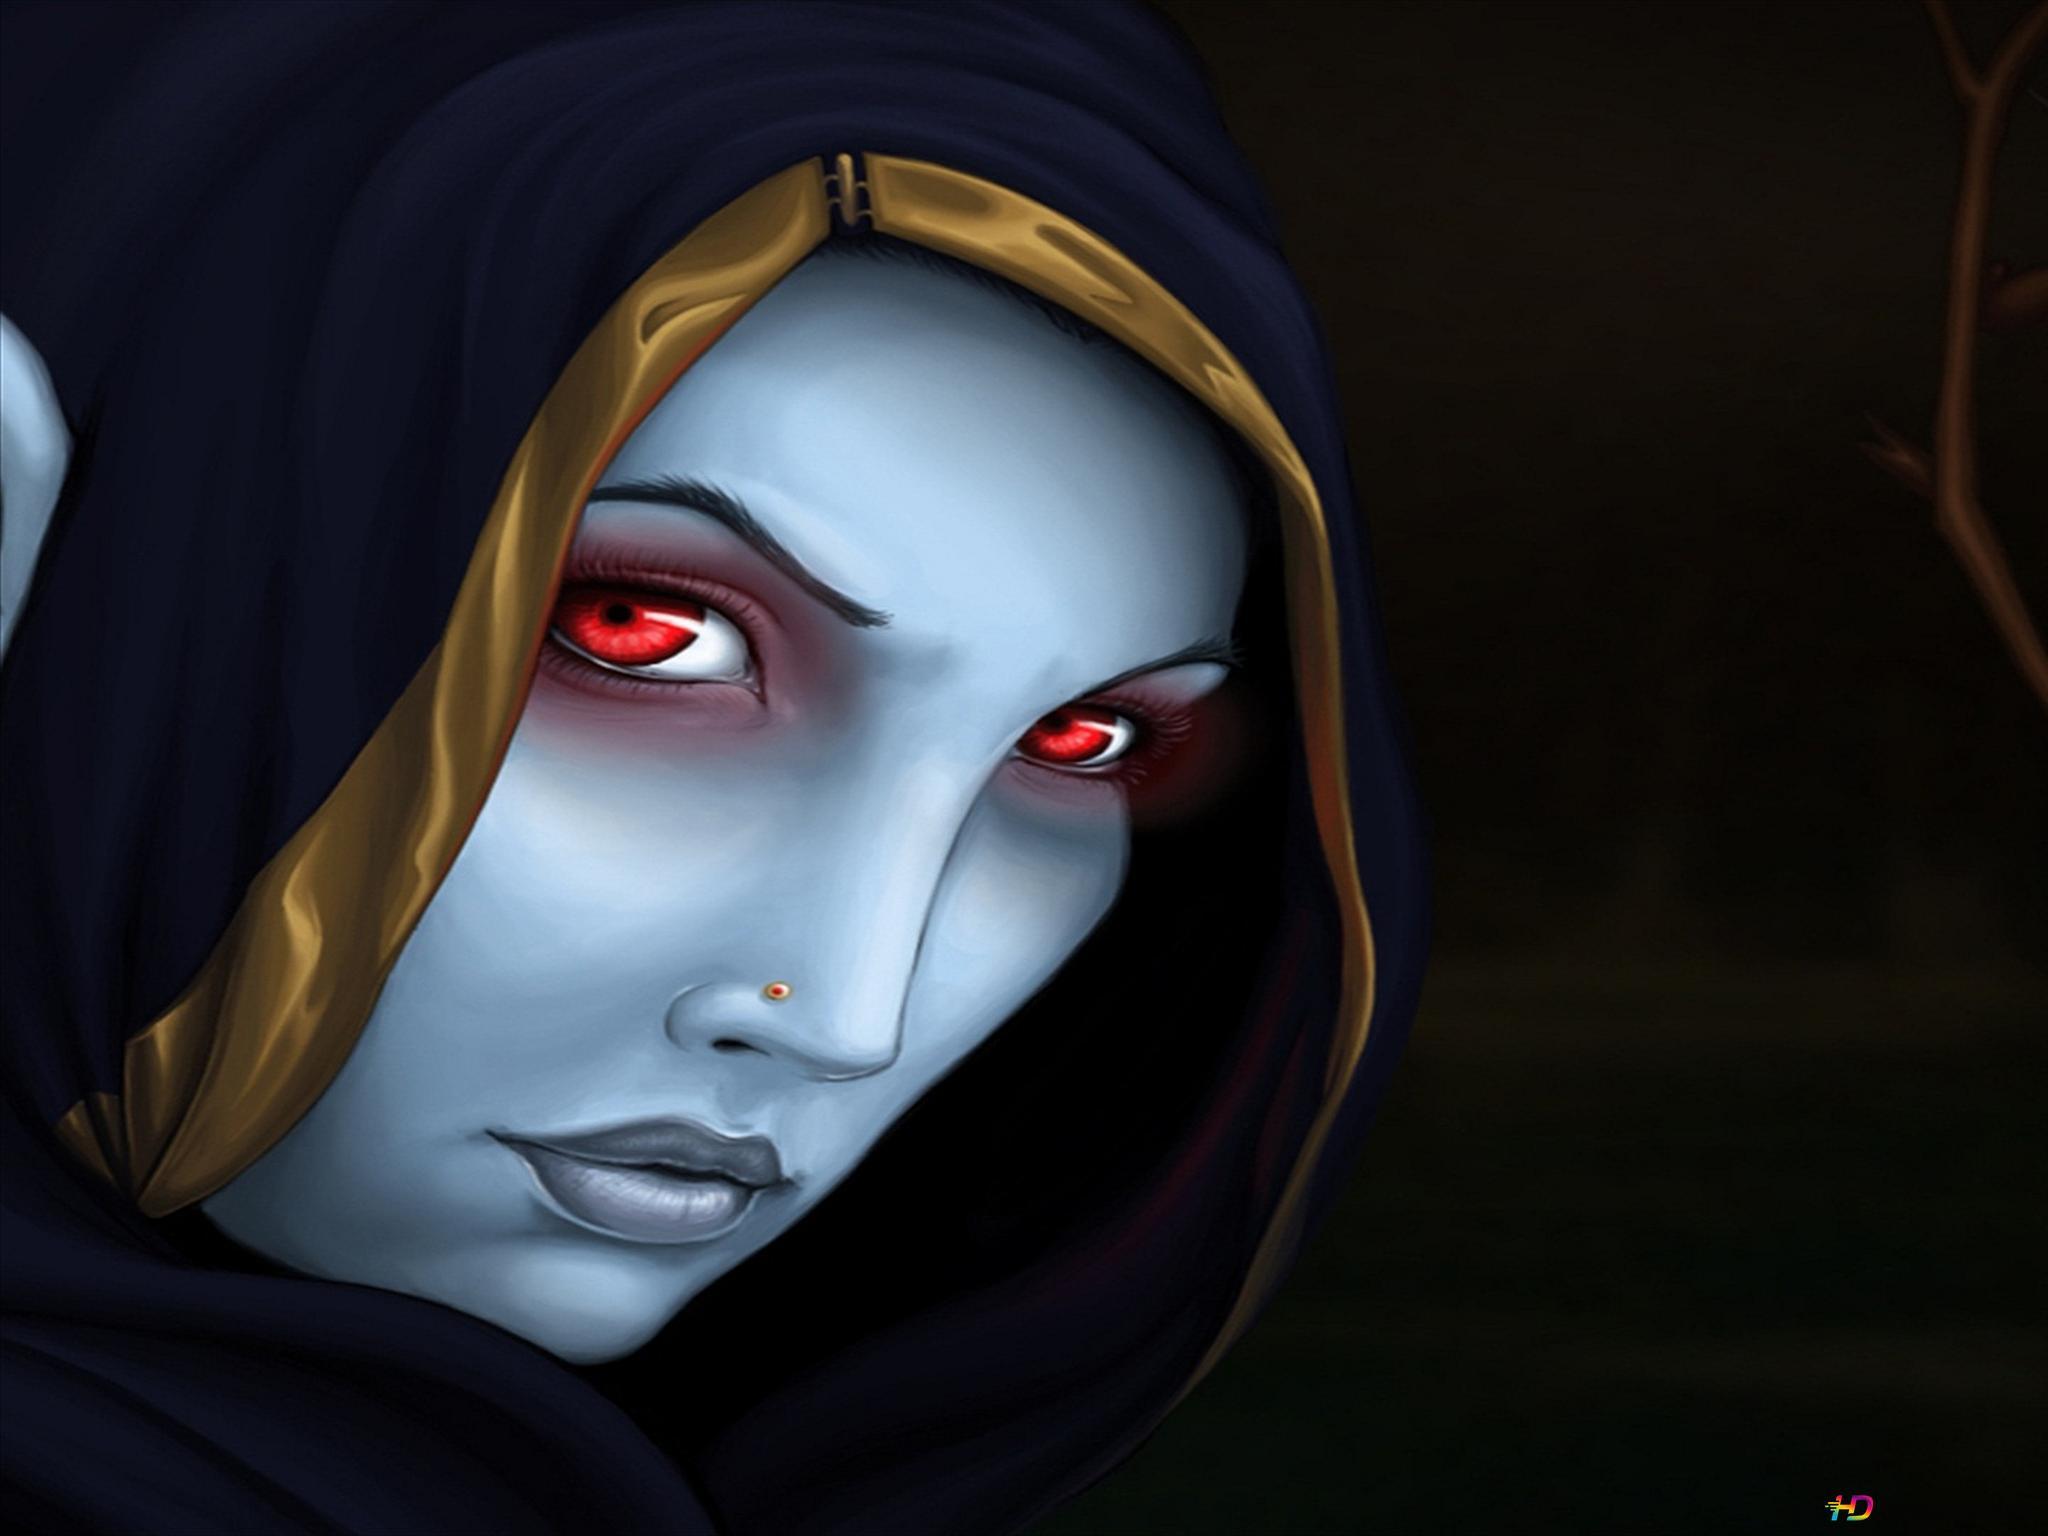 World Of Warcraft Sylvanas Windrunner Hd Wallpaper Download